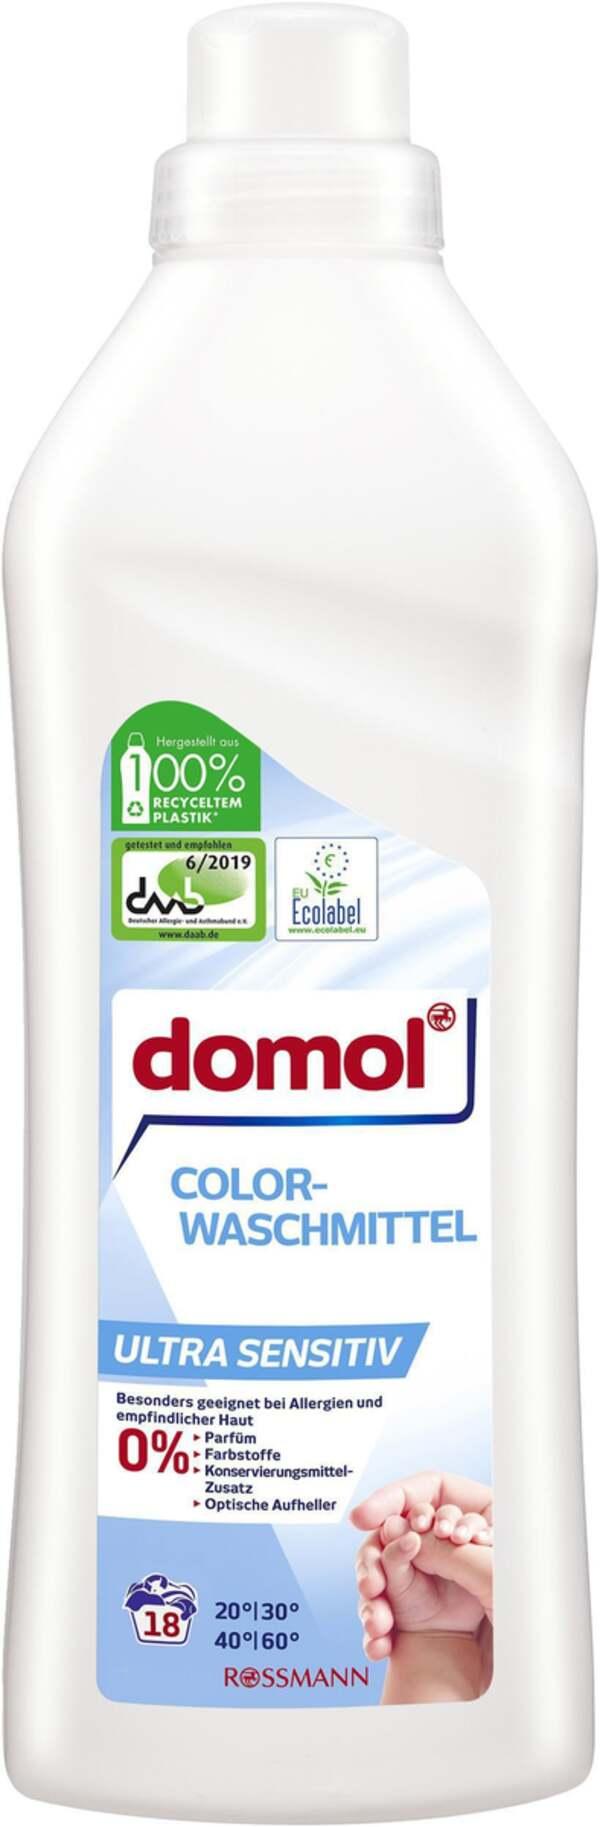 domol Color Flüssigwaschmittel Ultra Sensitiv 0.13 EUR/ 1 WL